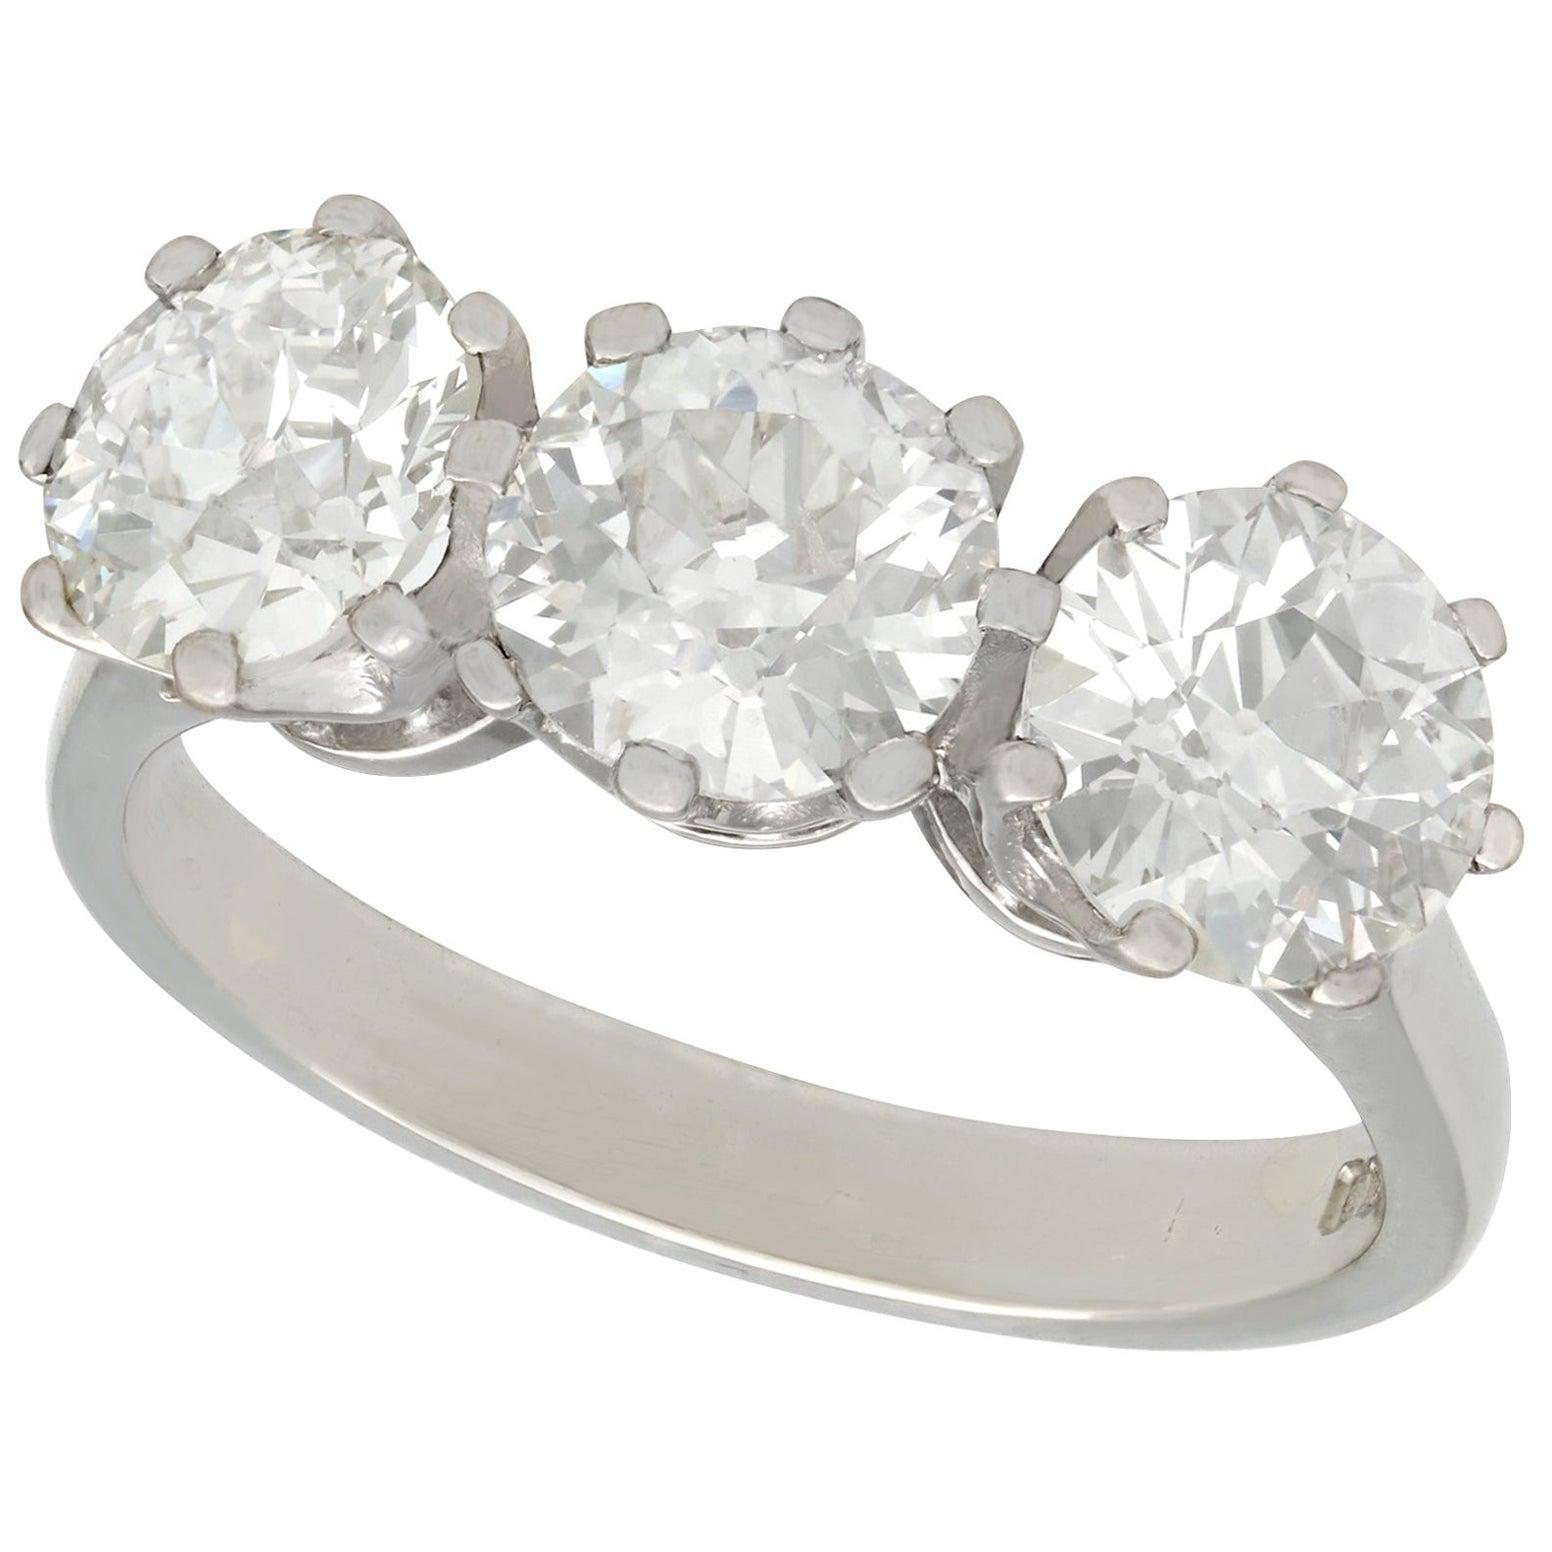 GIA Certified 3.09 Carat Diamond and Platinum Trilogy Ring